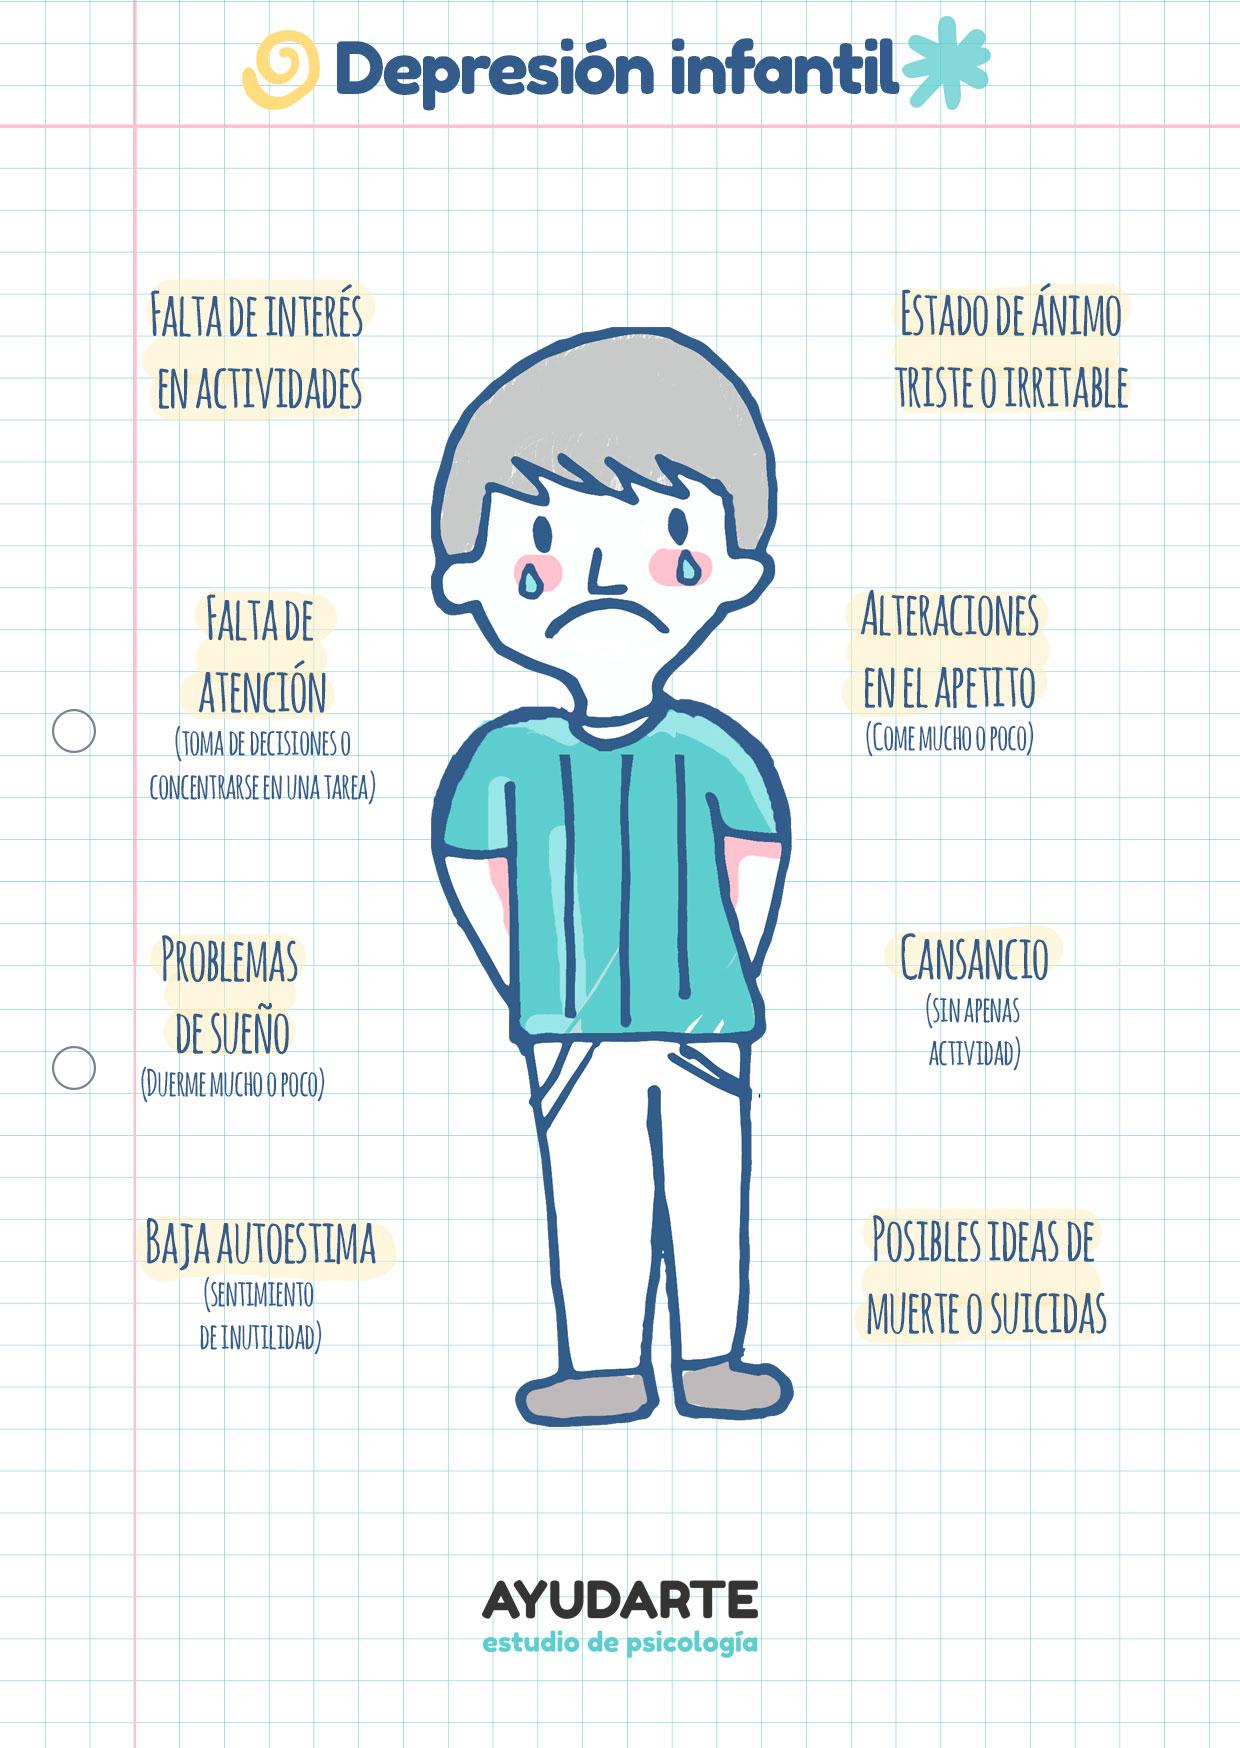 depresión infantil síntomas